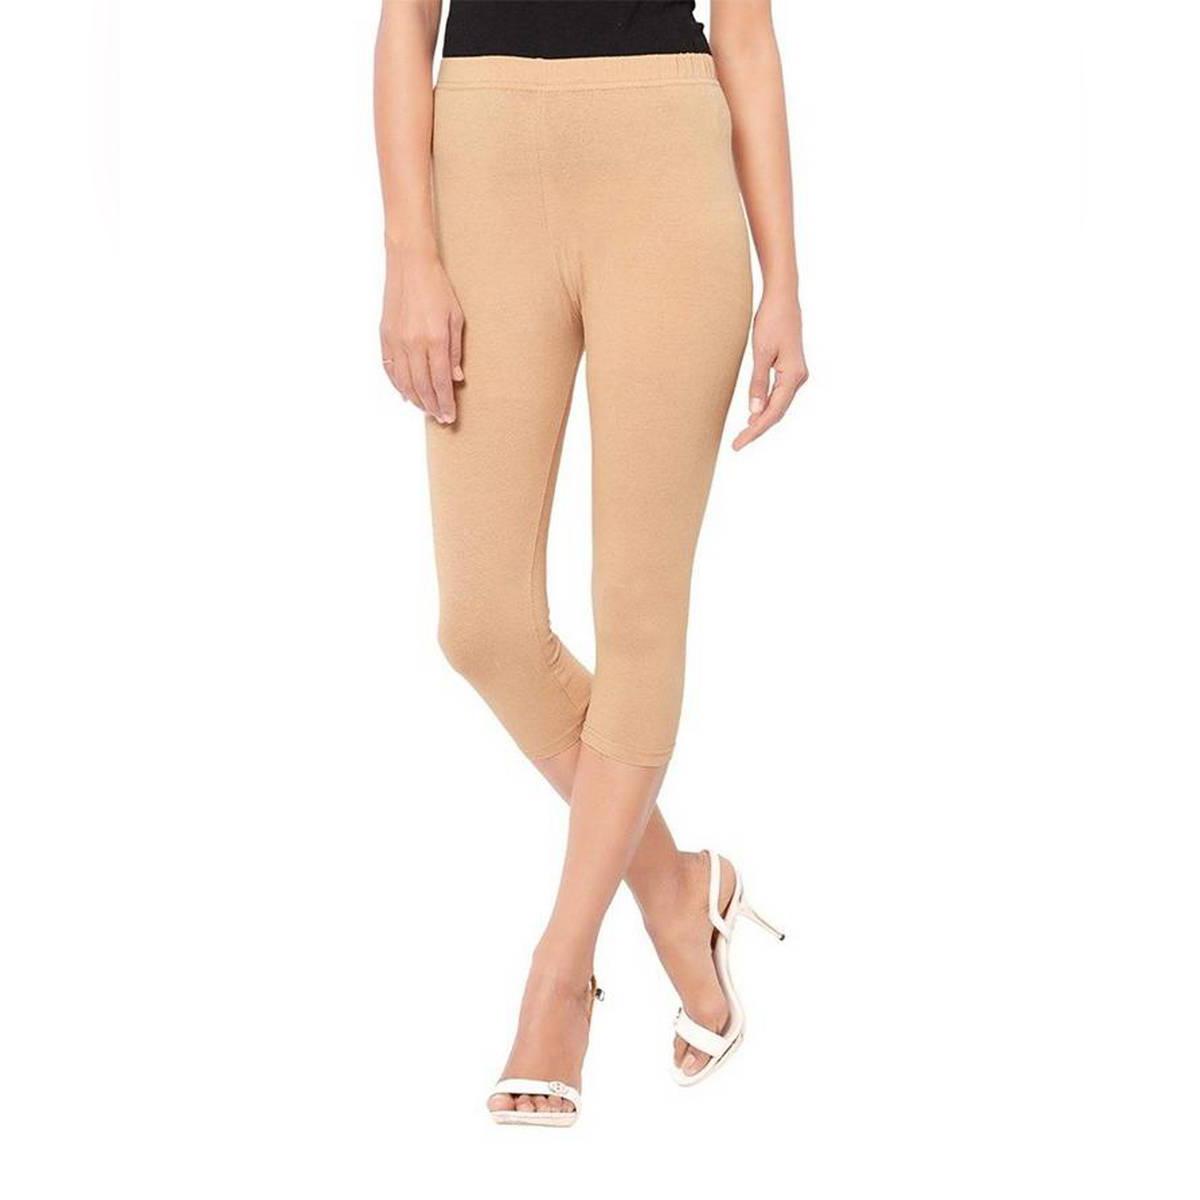 Activewear Beige Cotton Capri Leggigns For Women